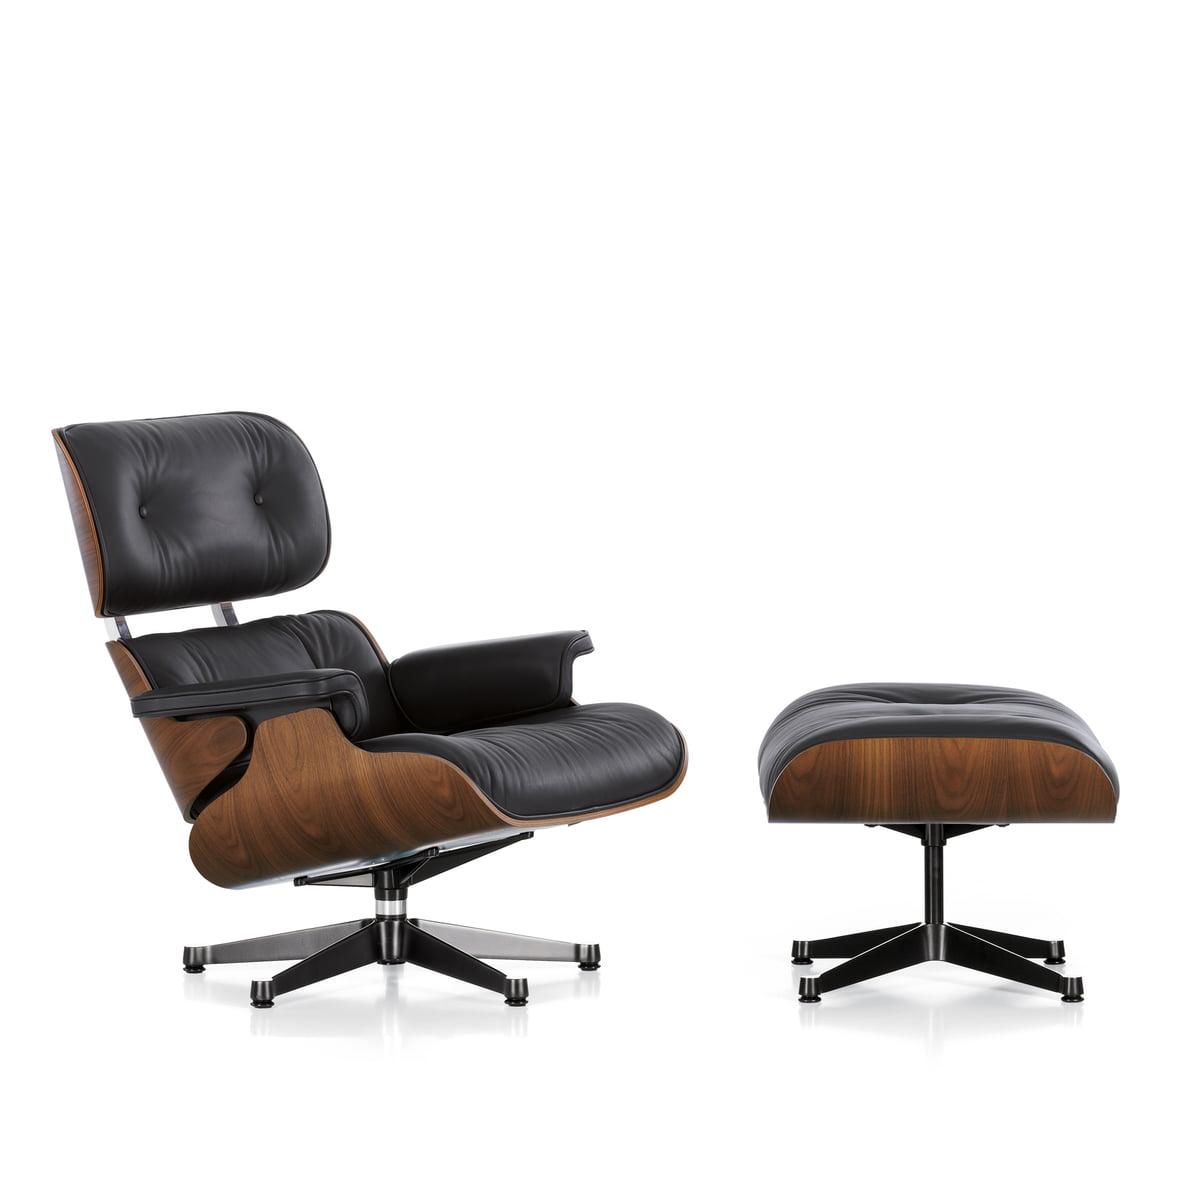 Vitra Lounge Chair Ottomann Polished Black Sides Walnut New Size